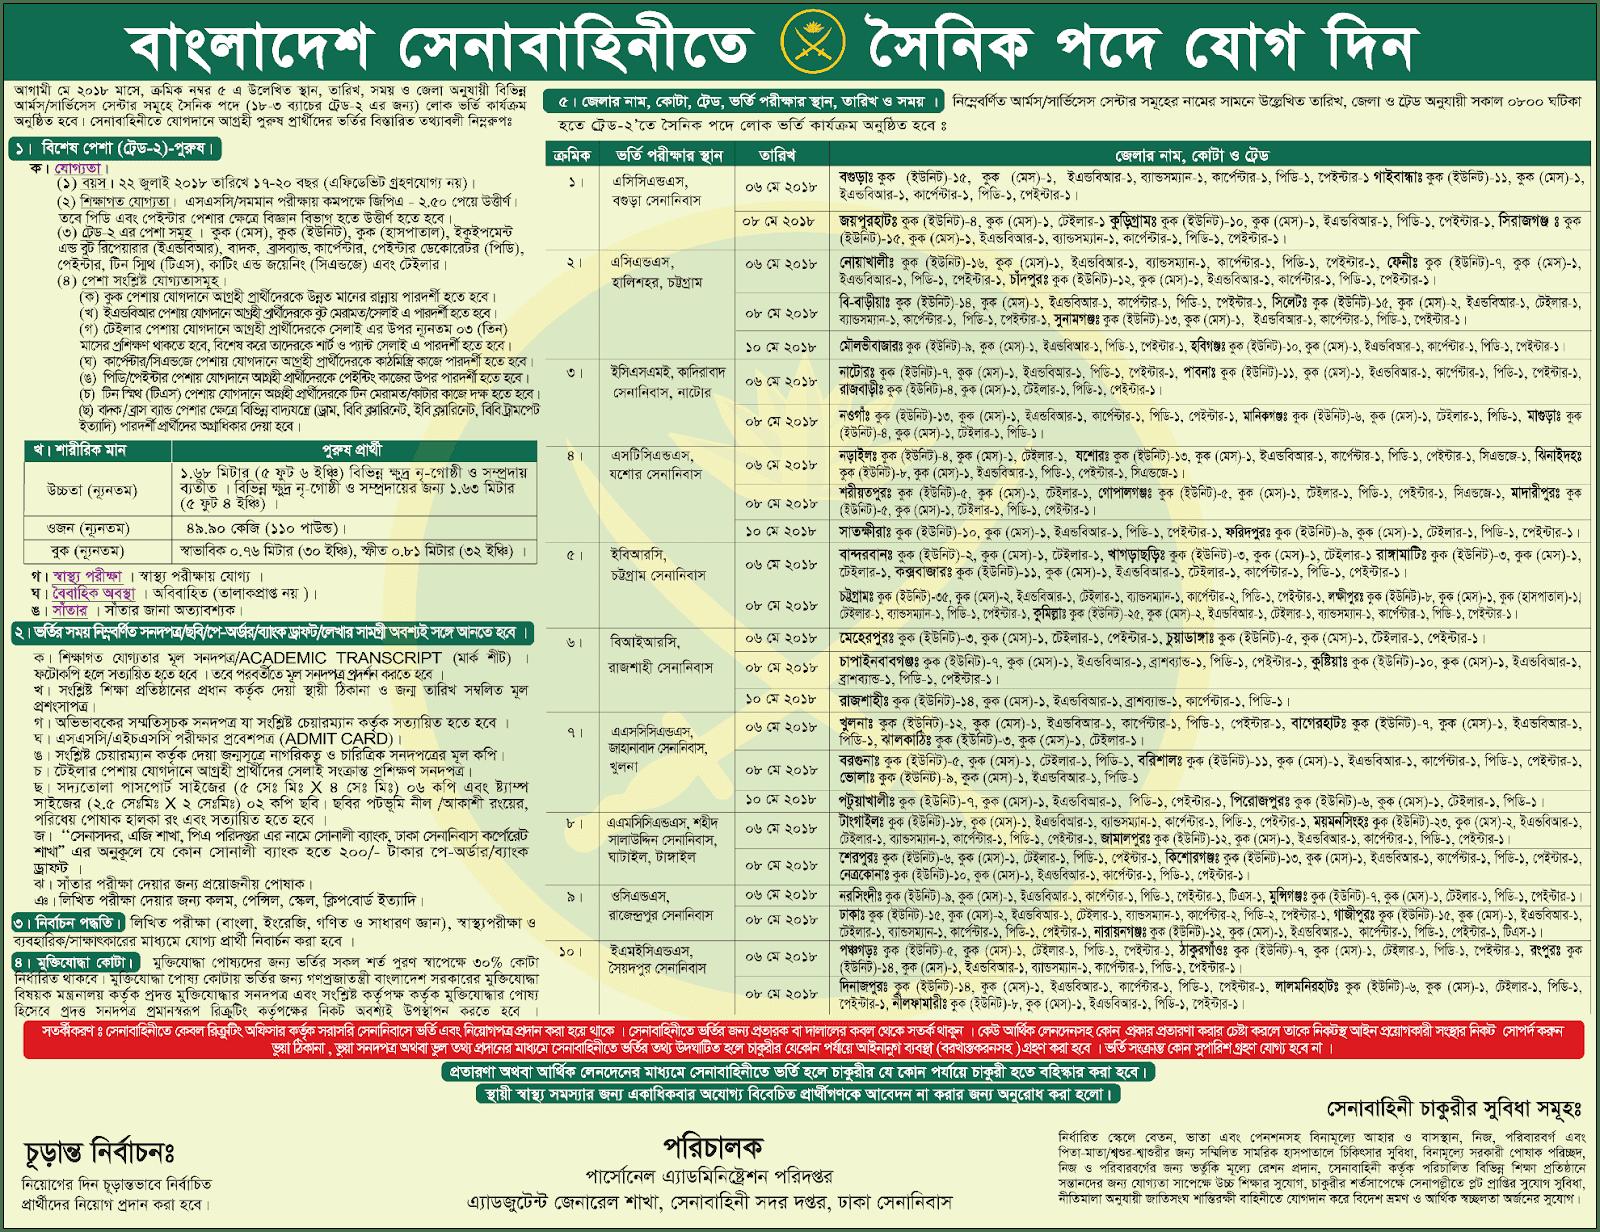 Bangladesh Army Job Circular 2018